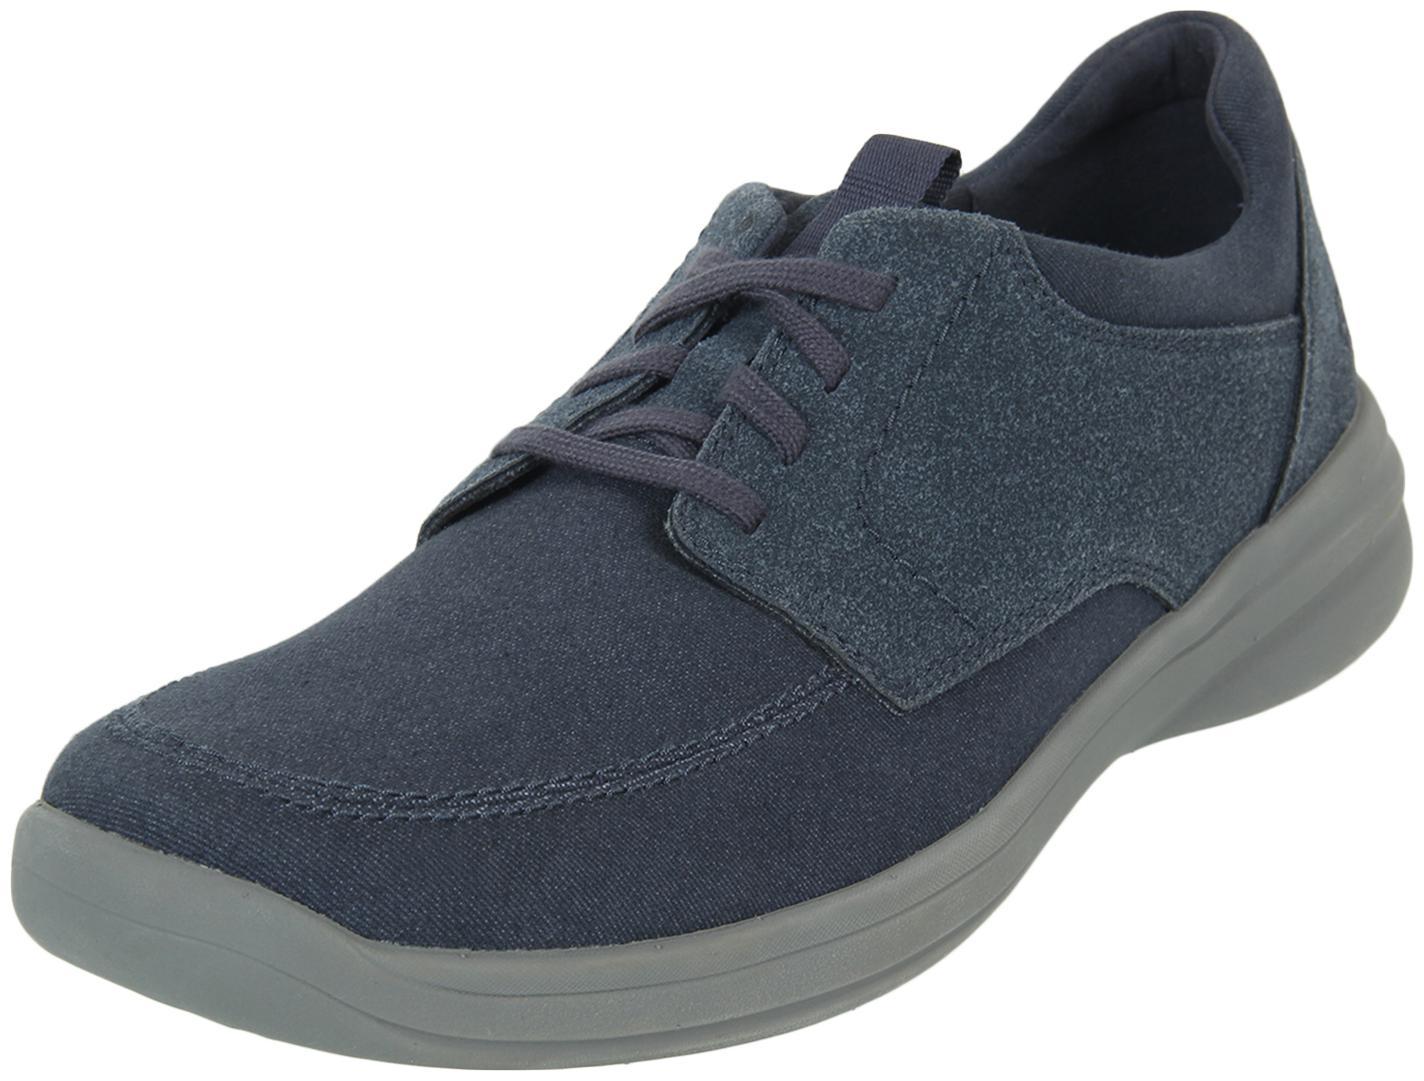 Clarks Men Sports Shoes Walking Shoes